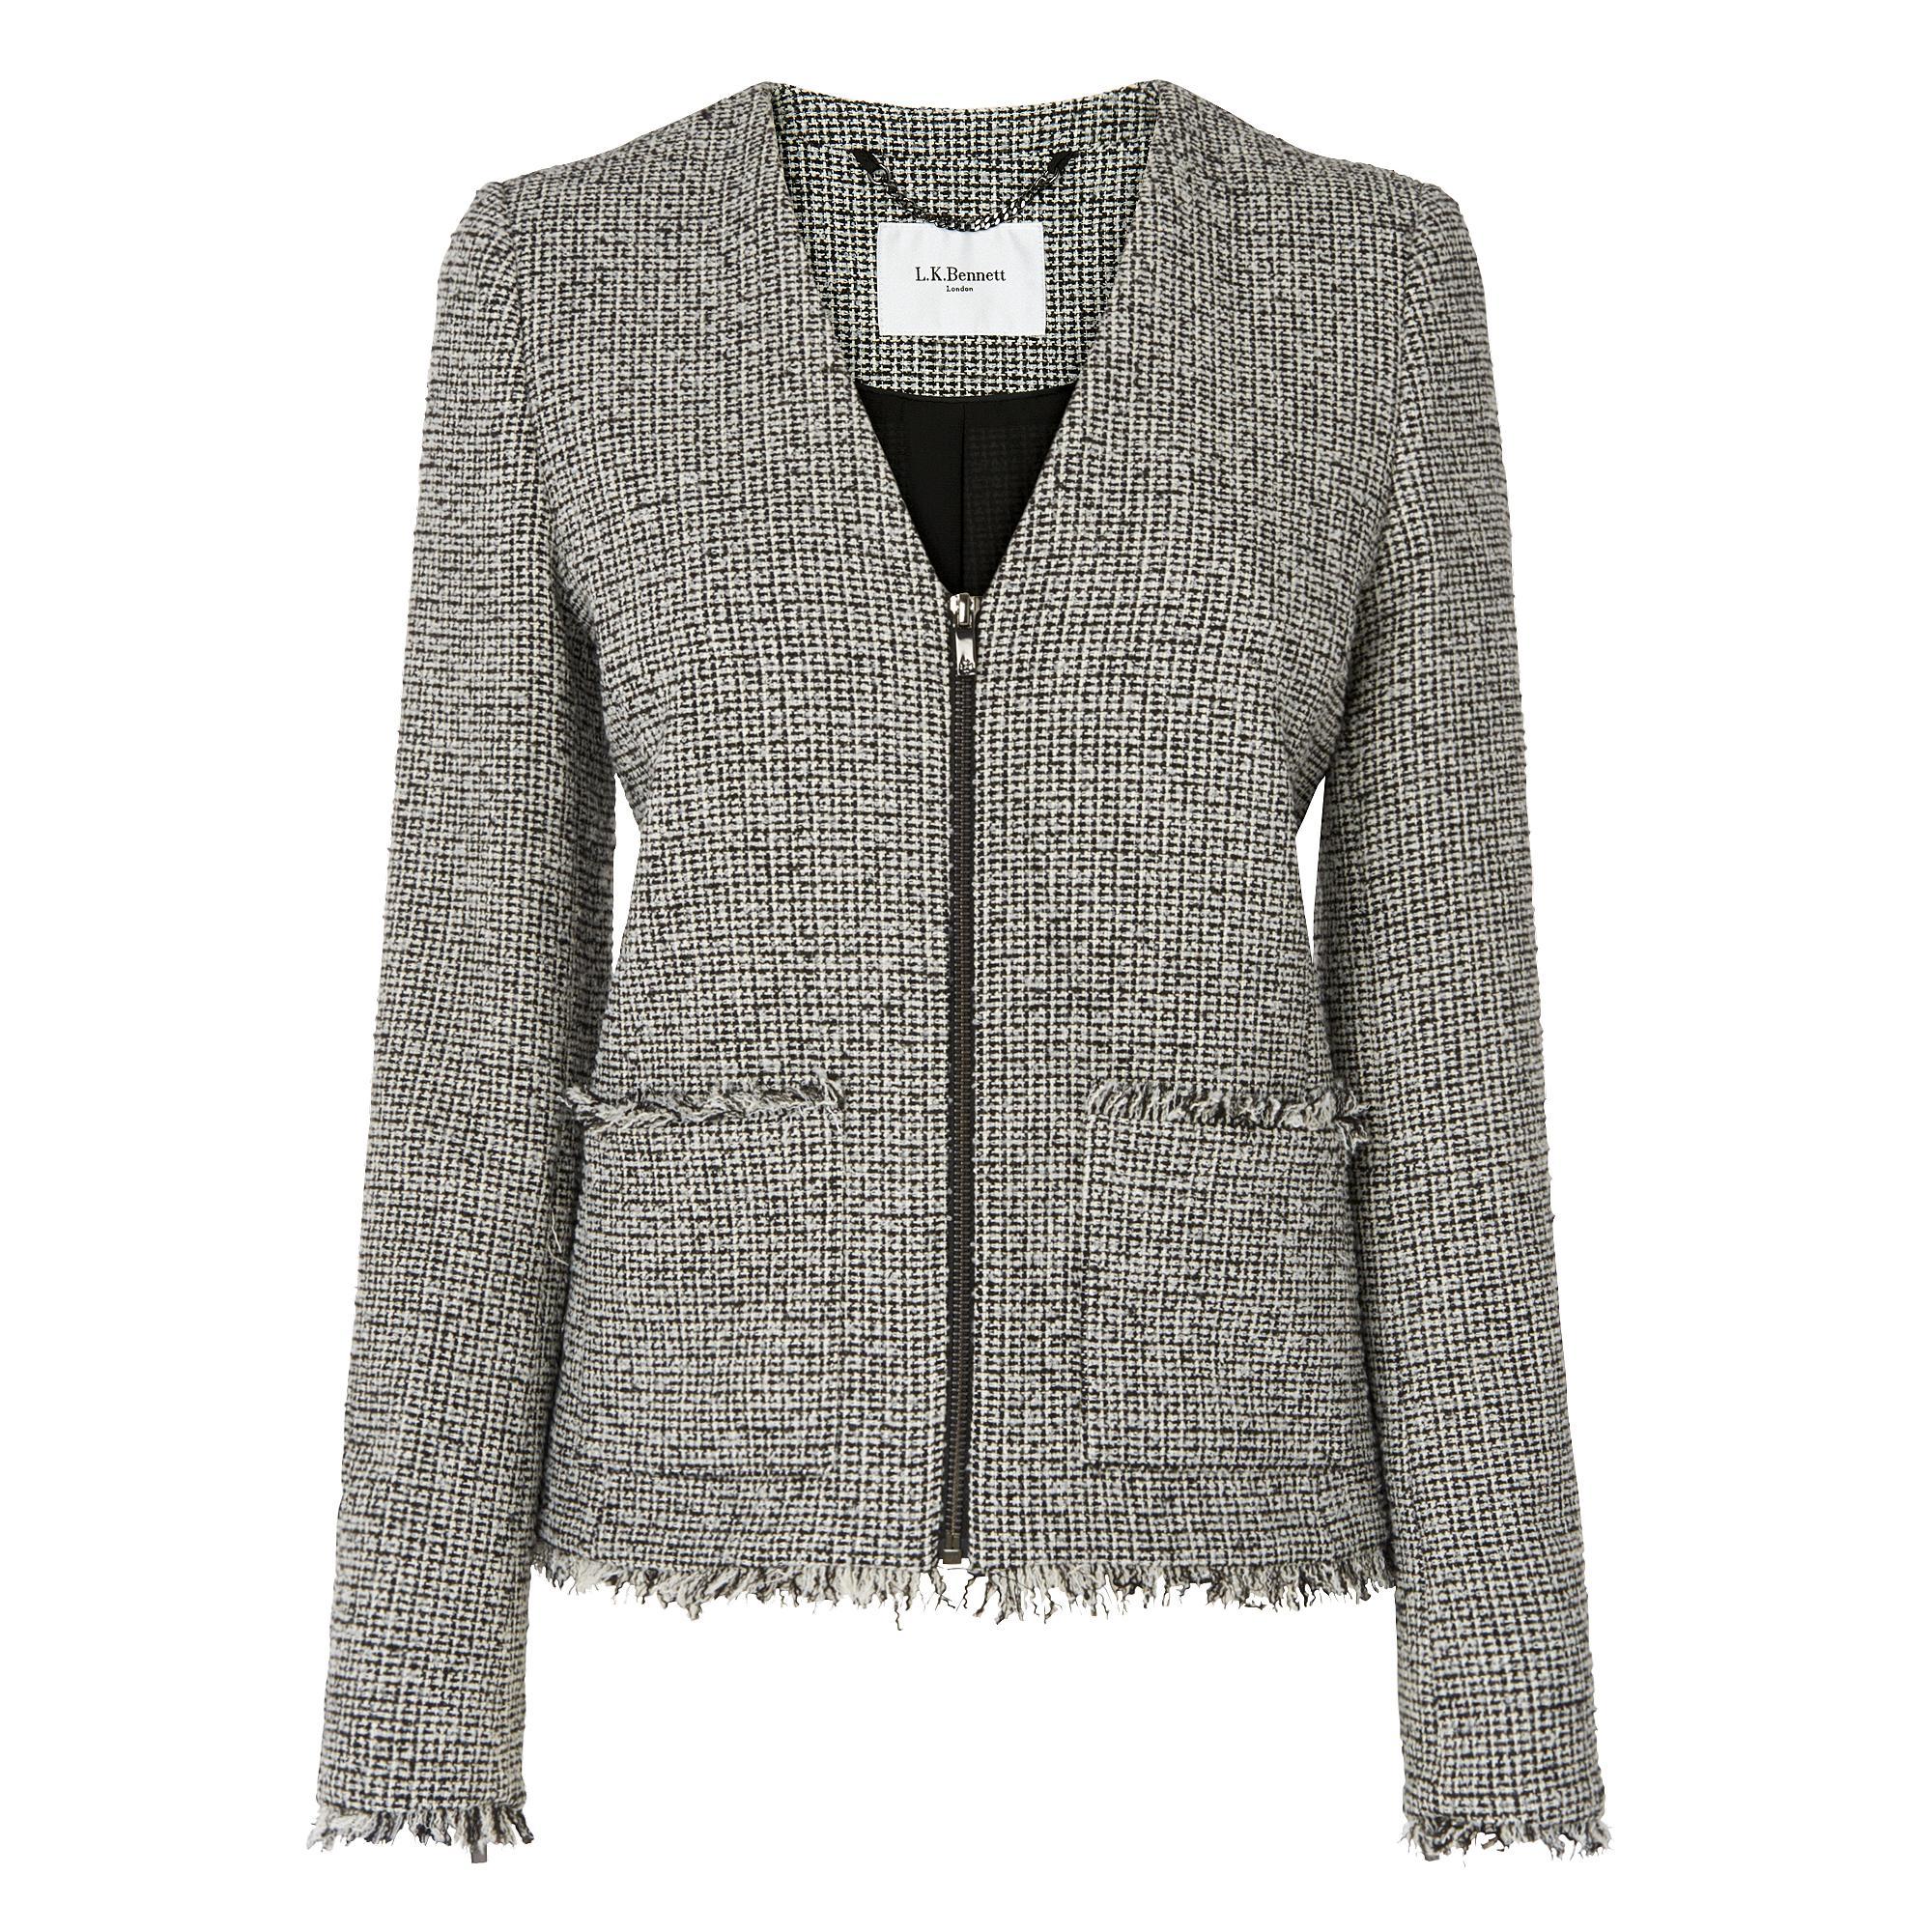 L.K.Bennett Nessa Tweed Jacket